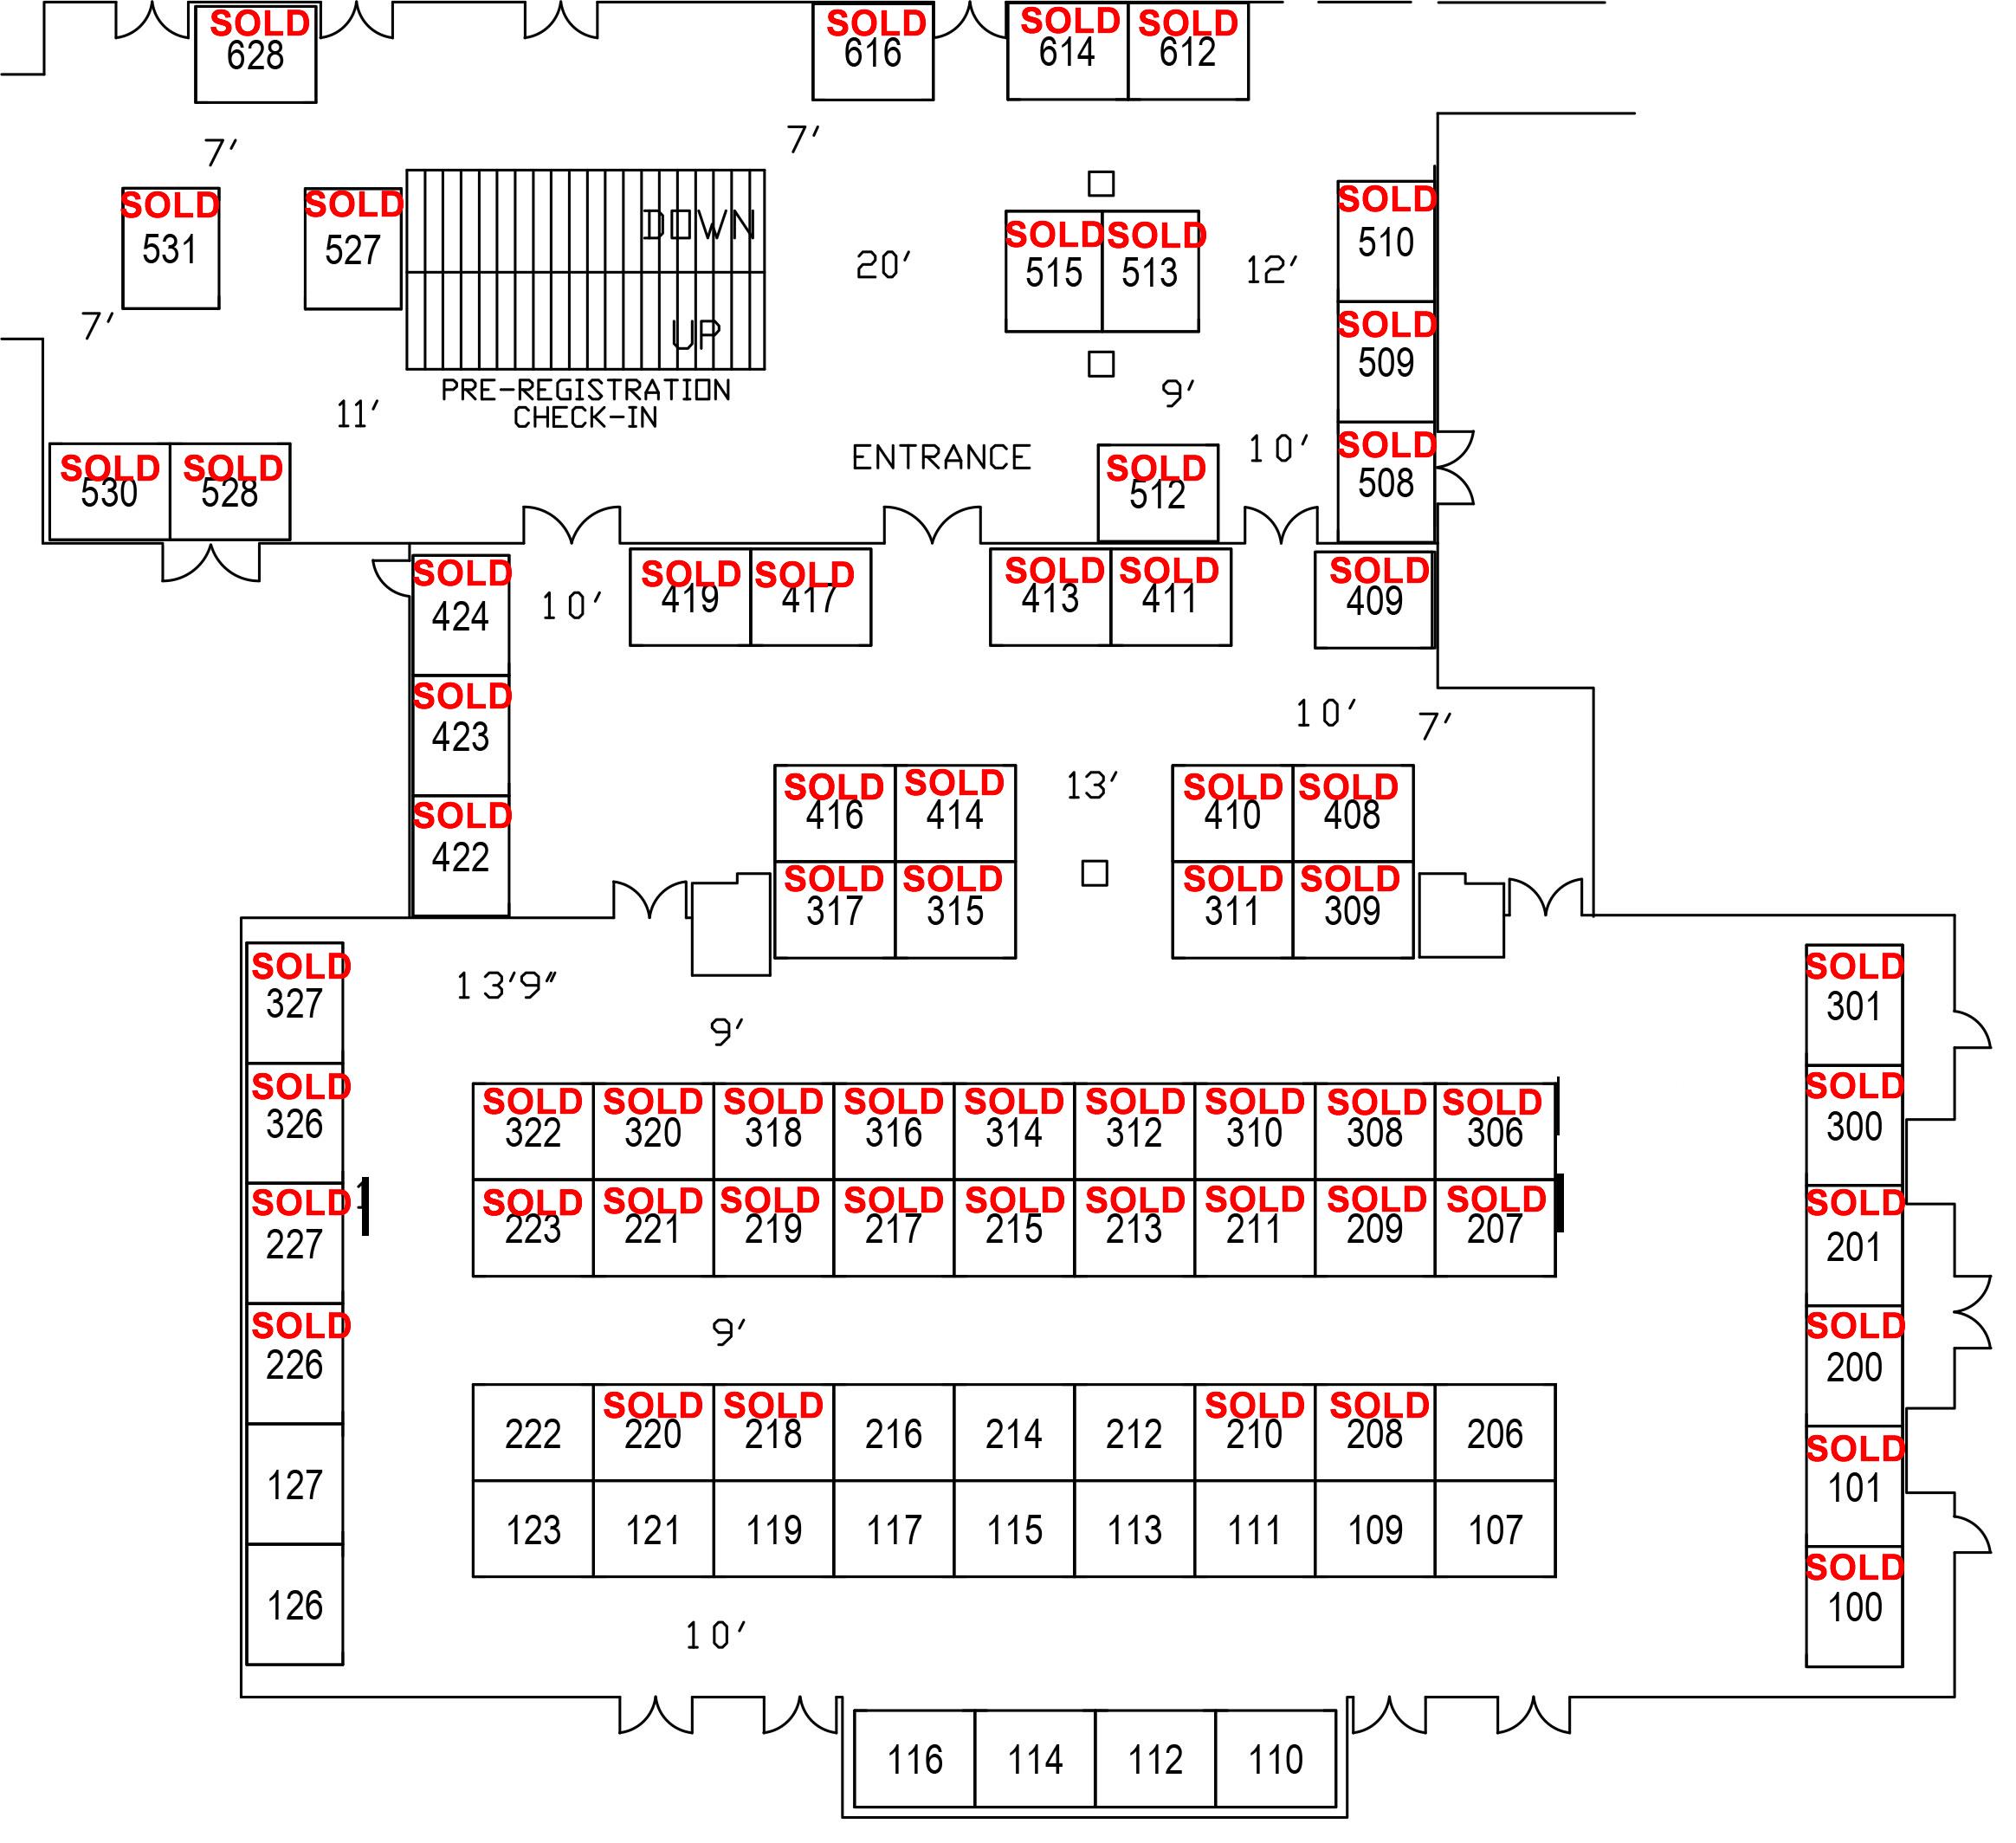 Tahoe Business Expo Floorplan